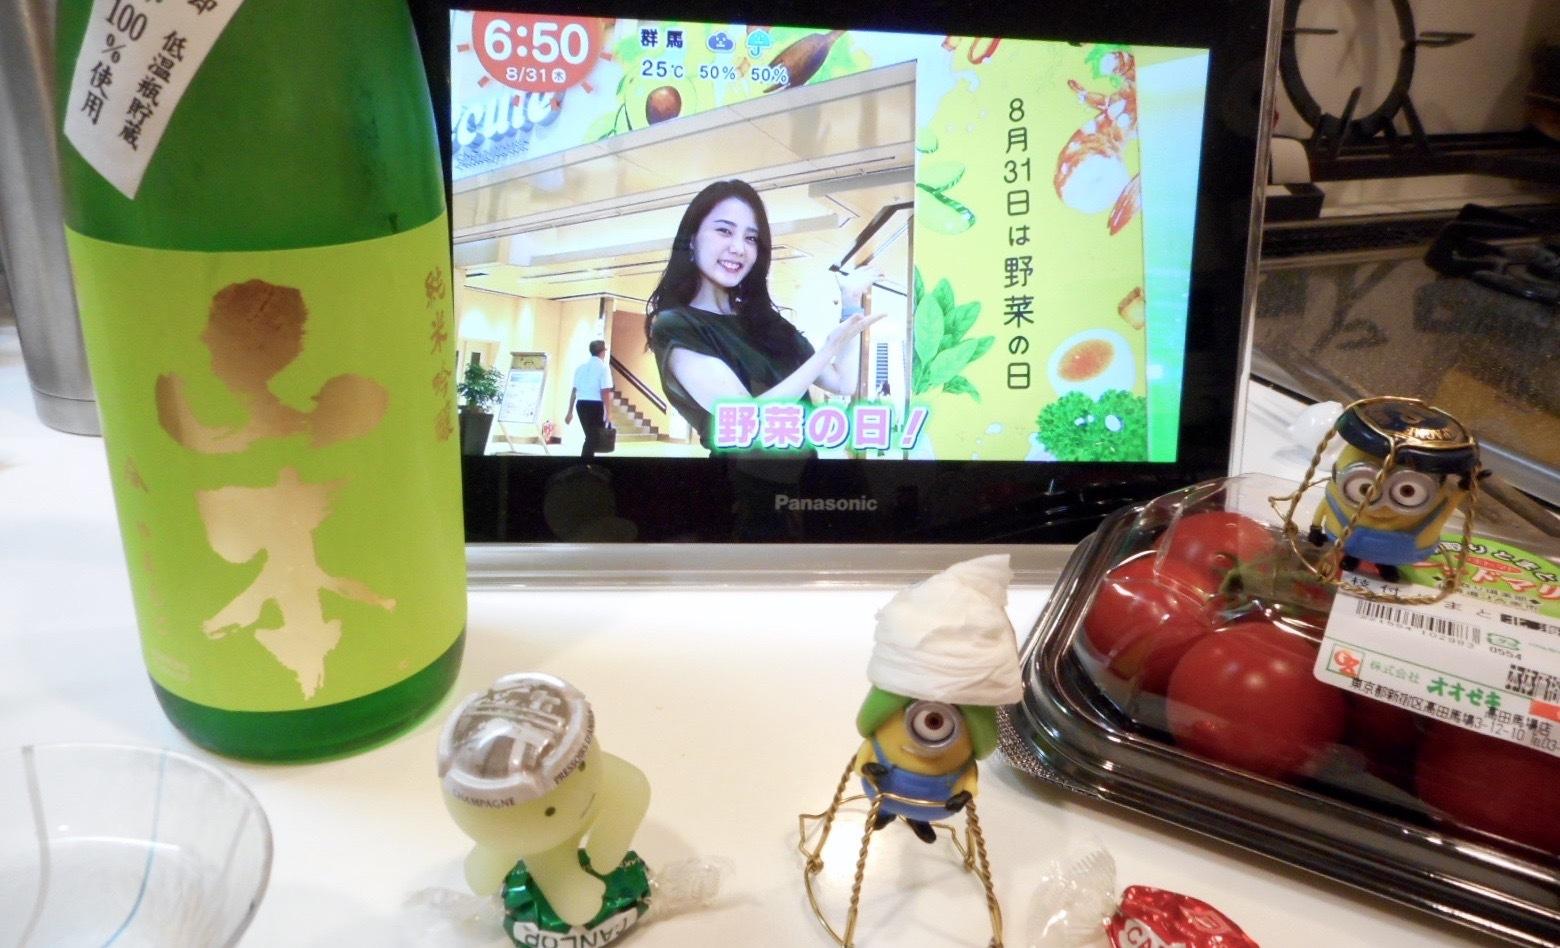 yamamoto_misatonishiki55_28by11.jpg